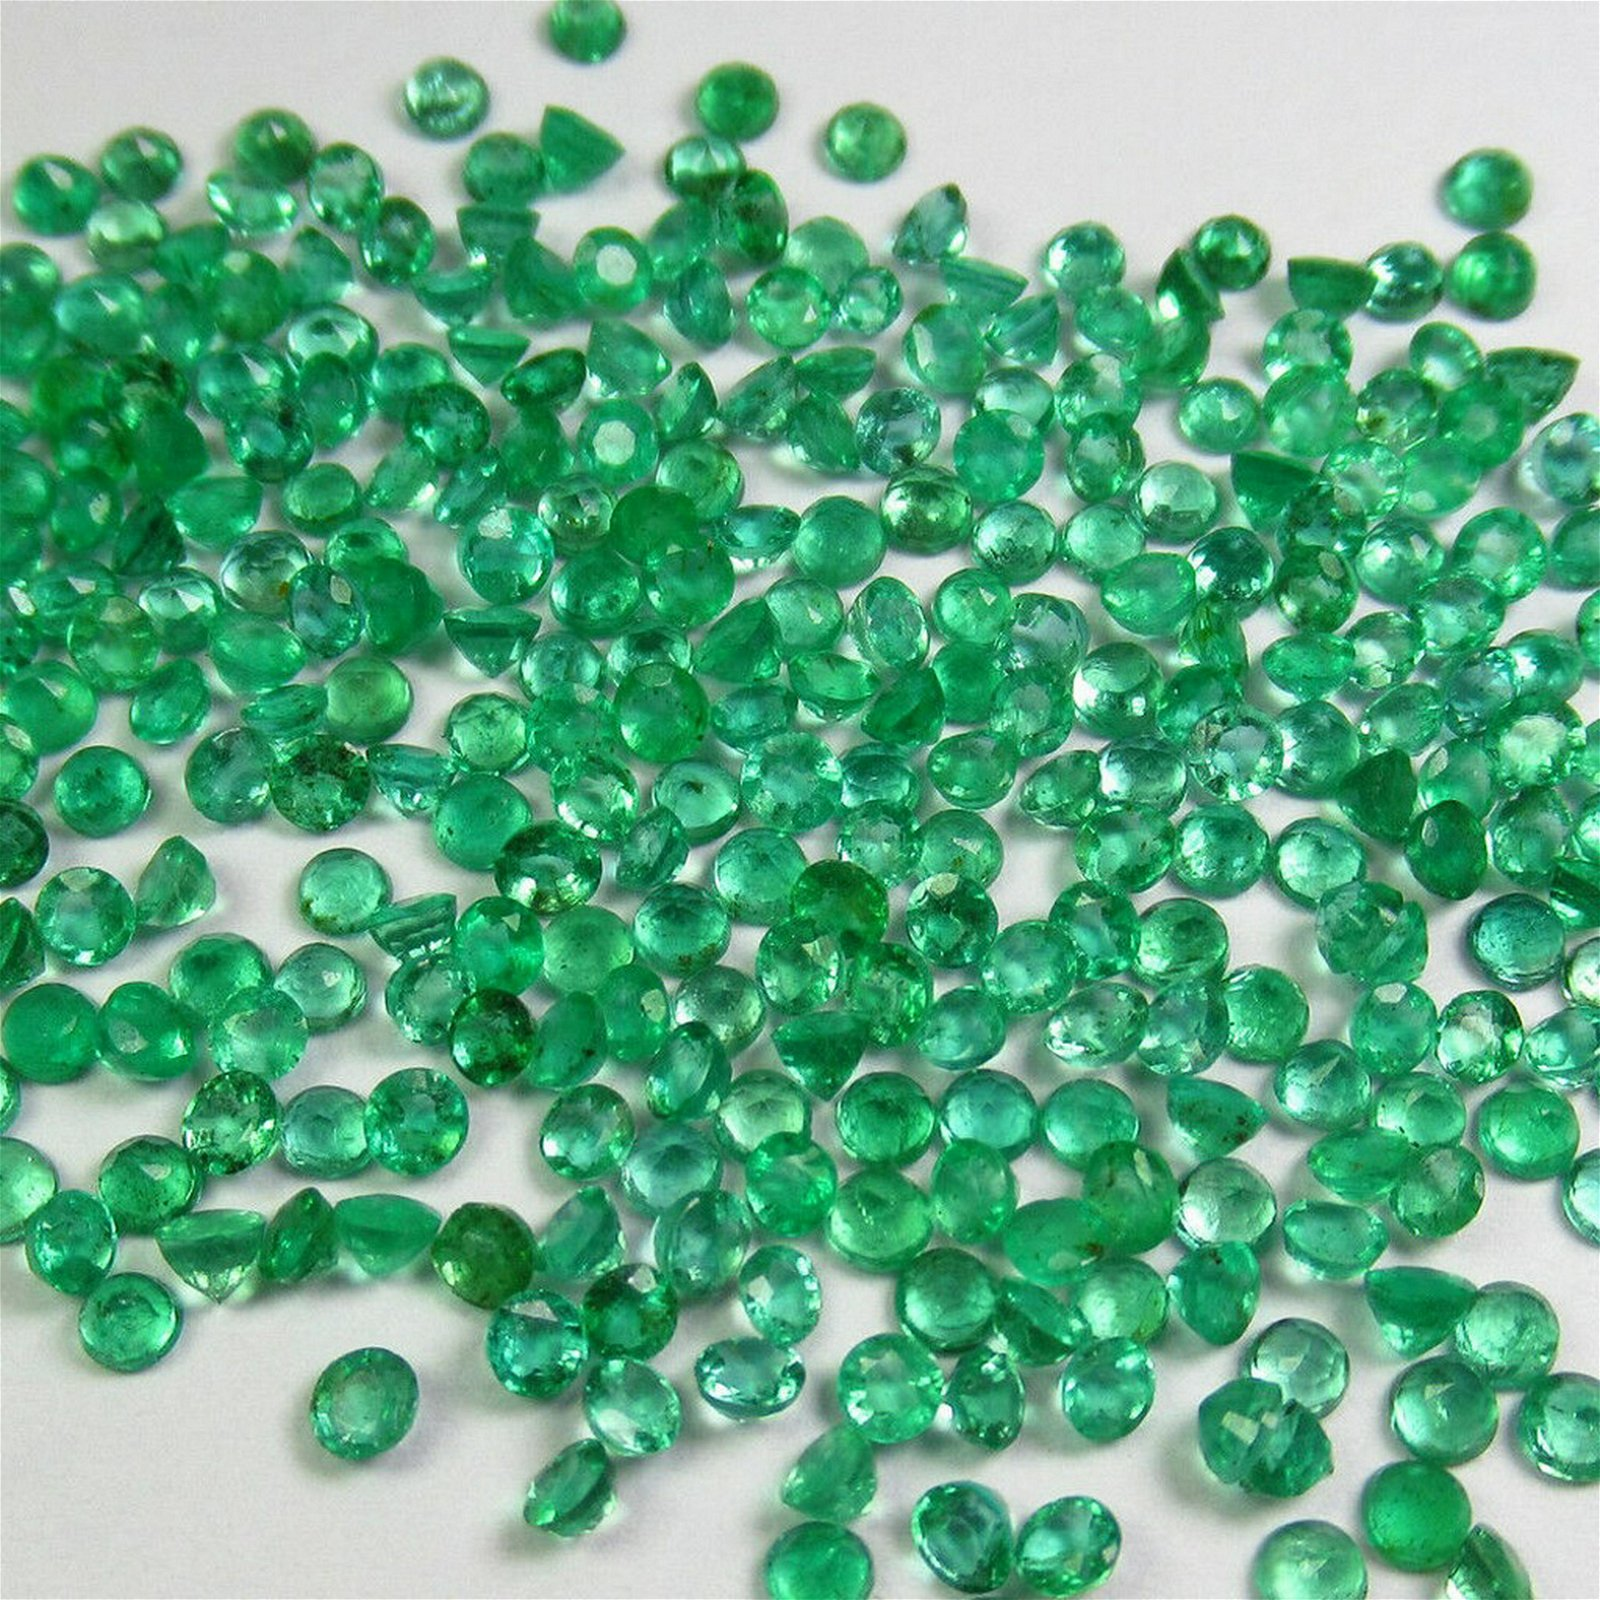 10.00 Ct Genuine 154 Emerald Calibrate 2.5 mm Round Lot